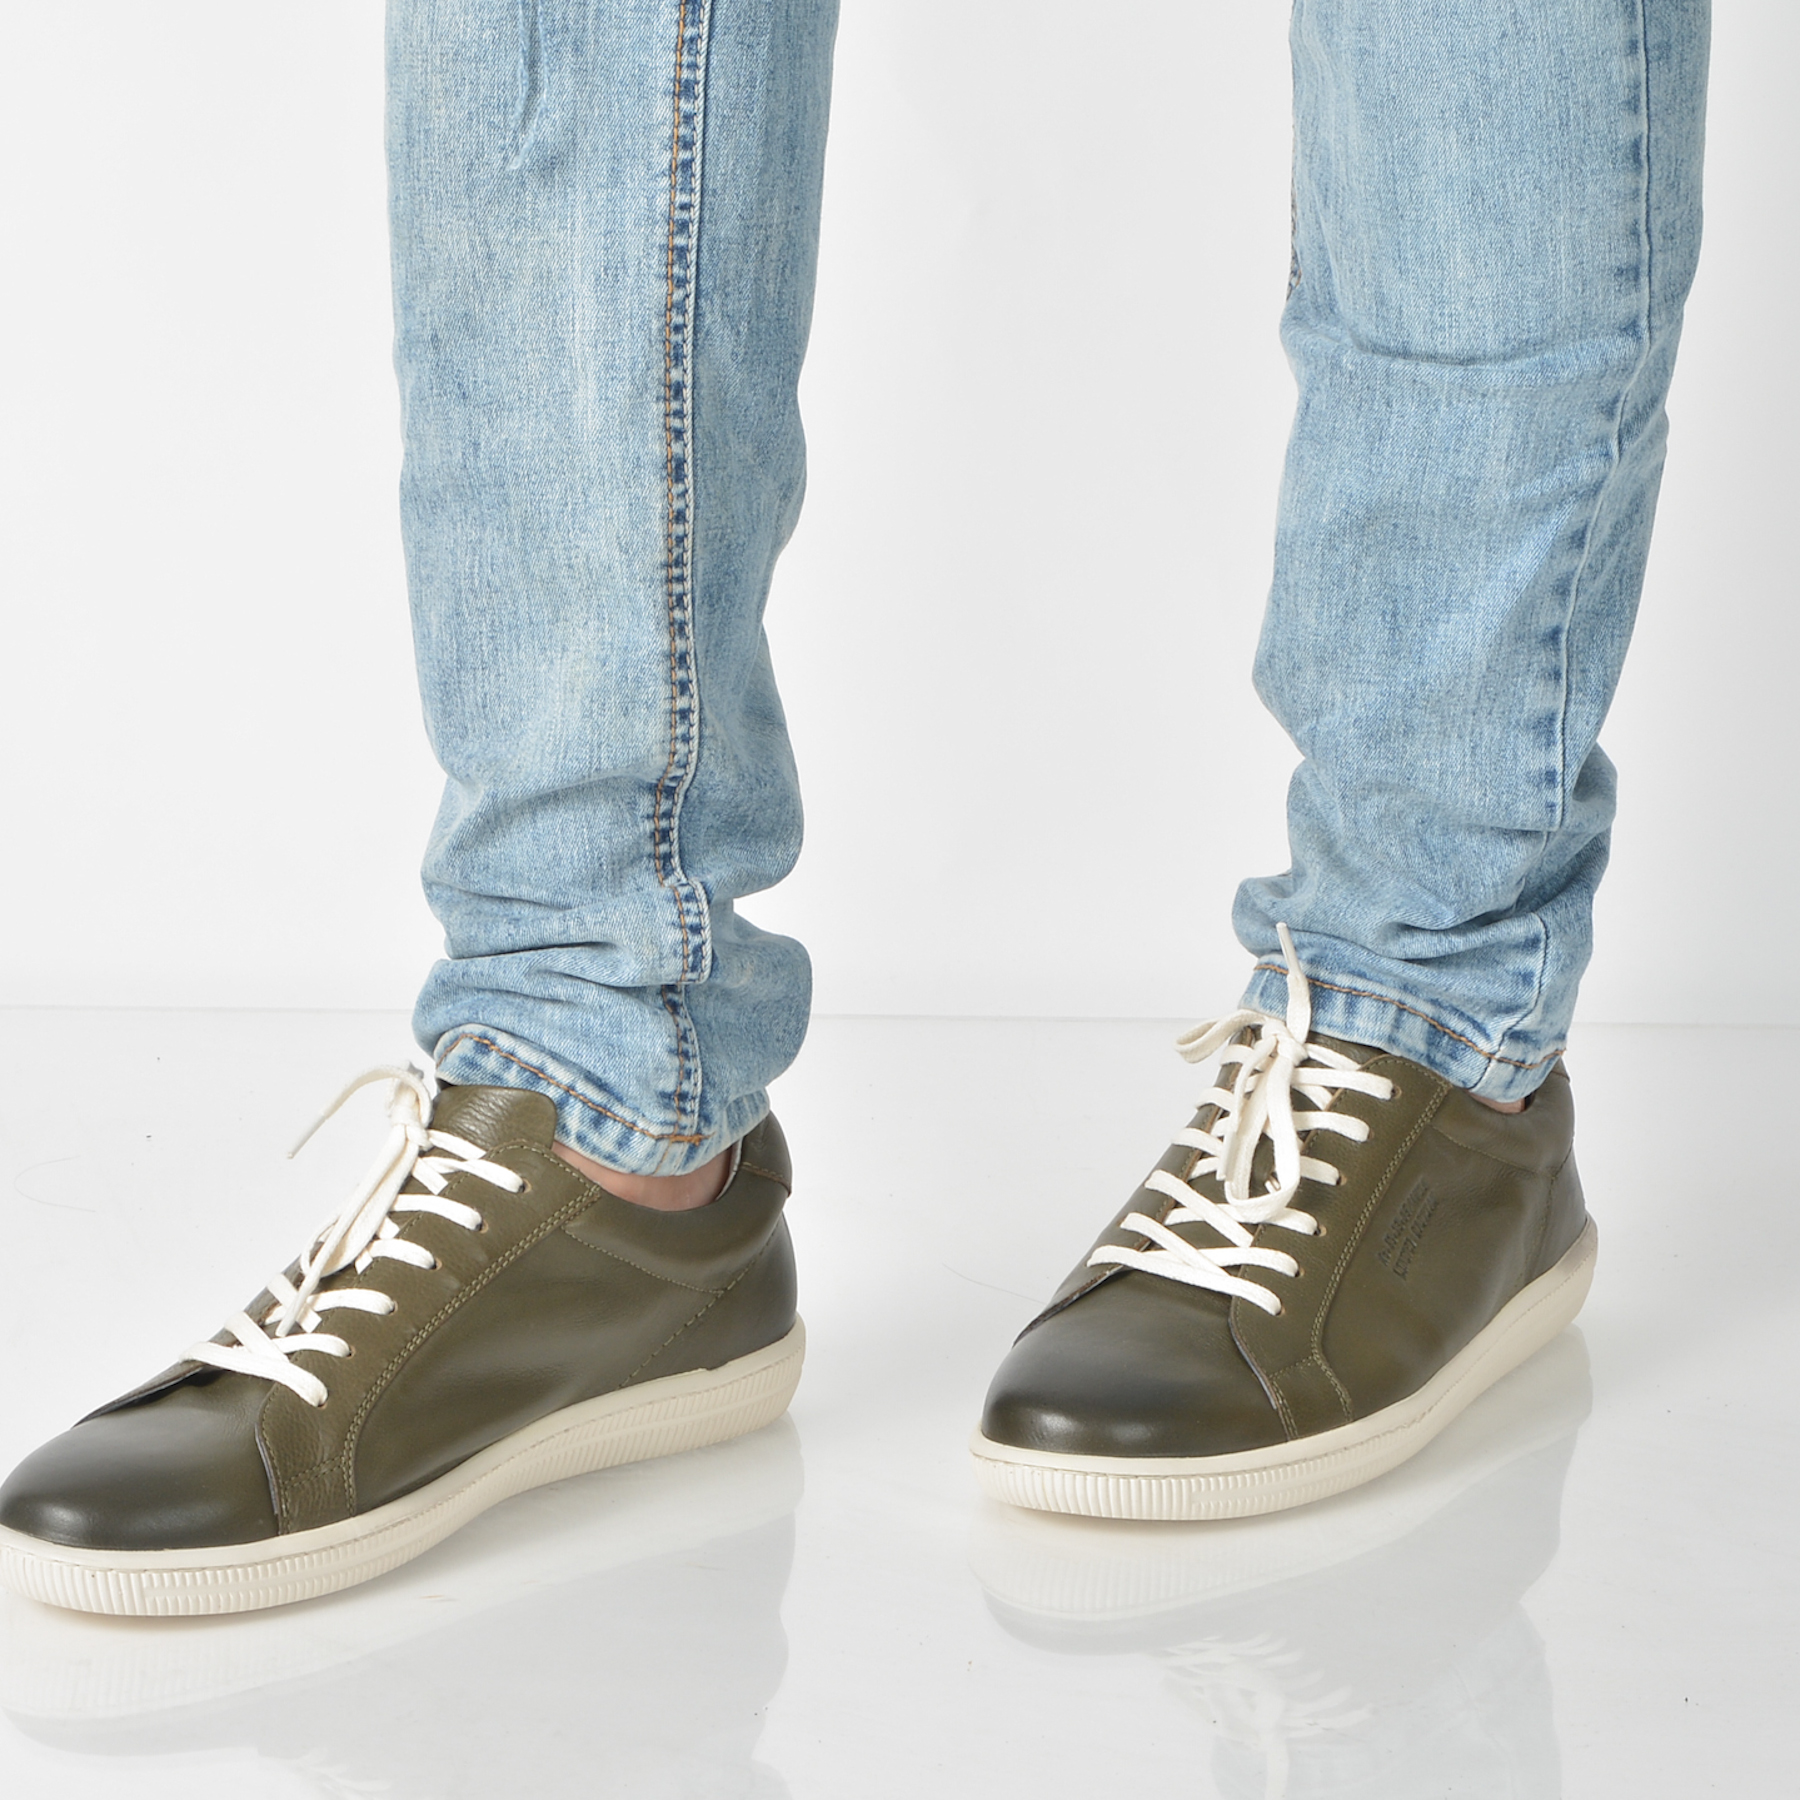 Pantofi Otter Kaki, 4240, Din Piele Naturala